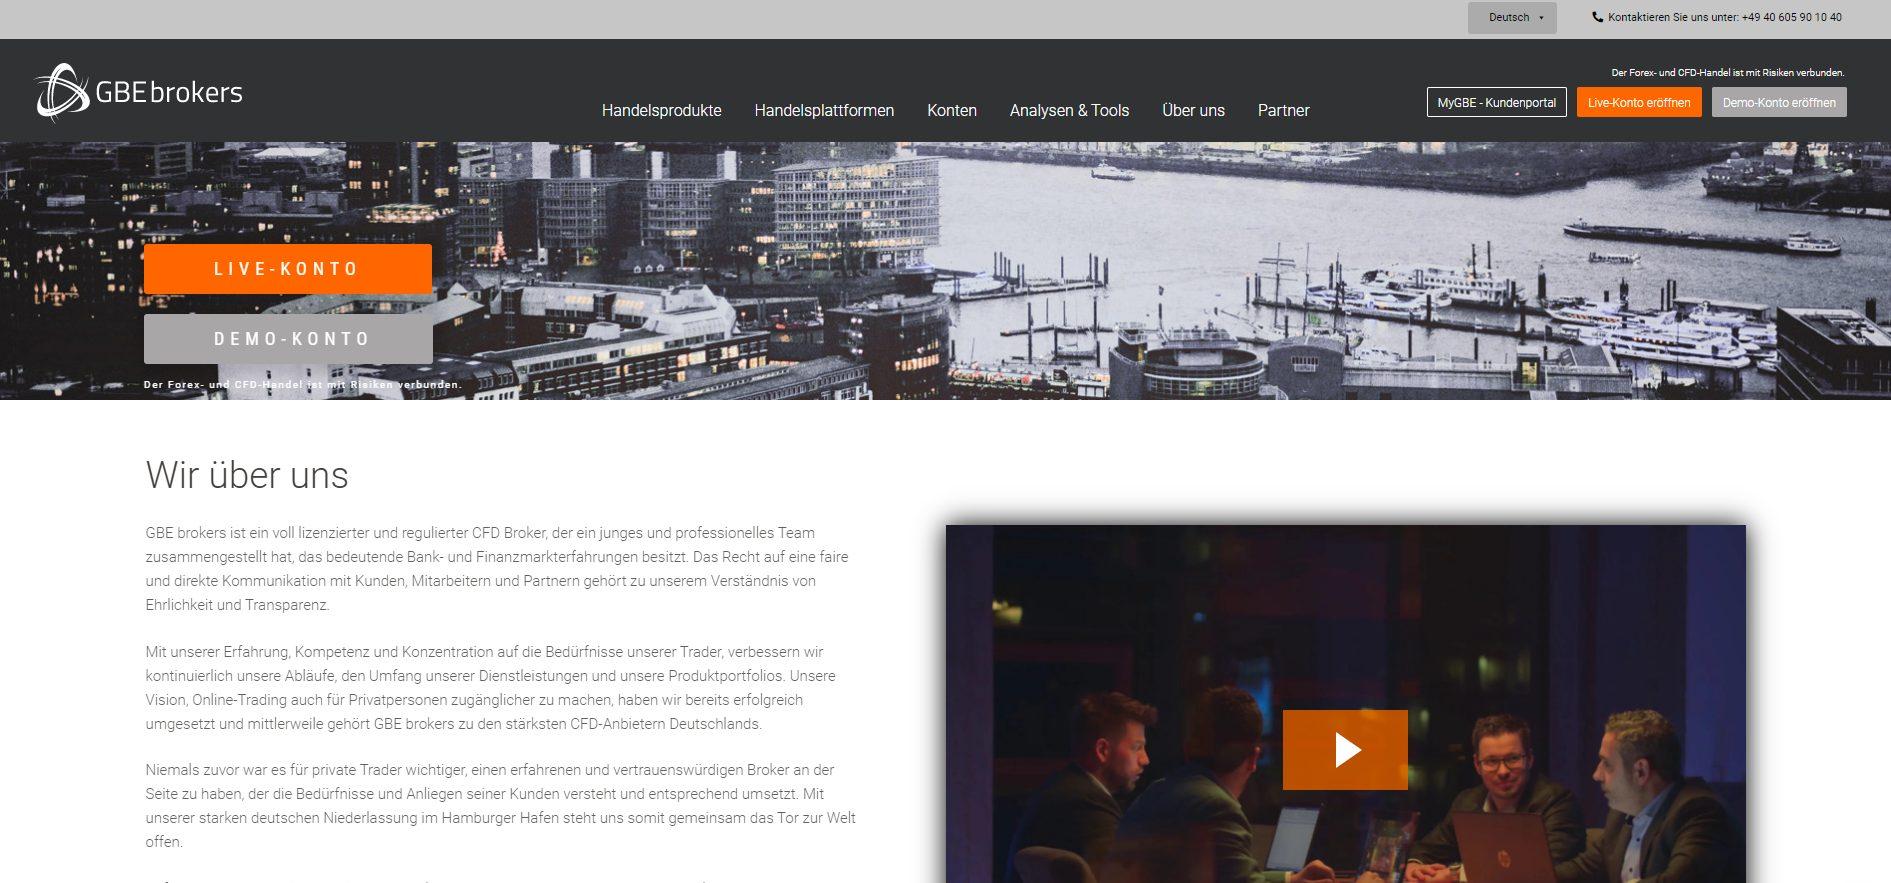 GBE Brokers CFD Broker Webseite